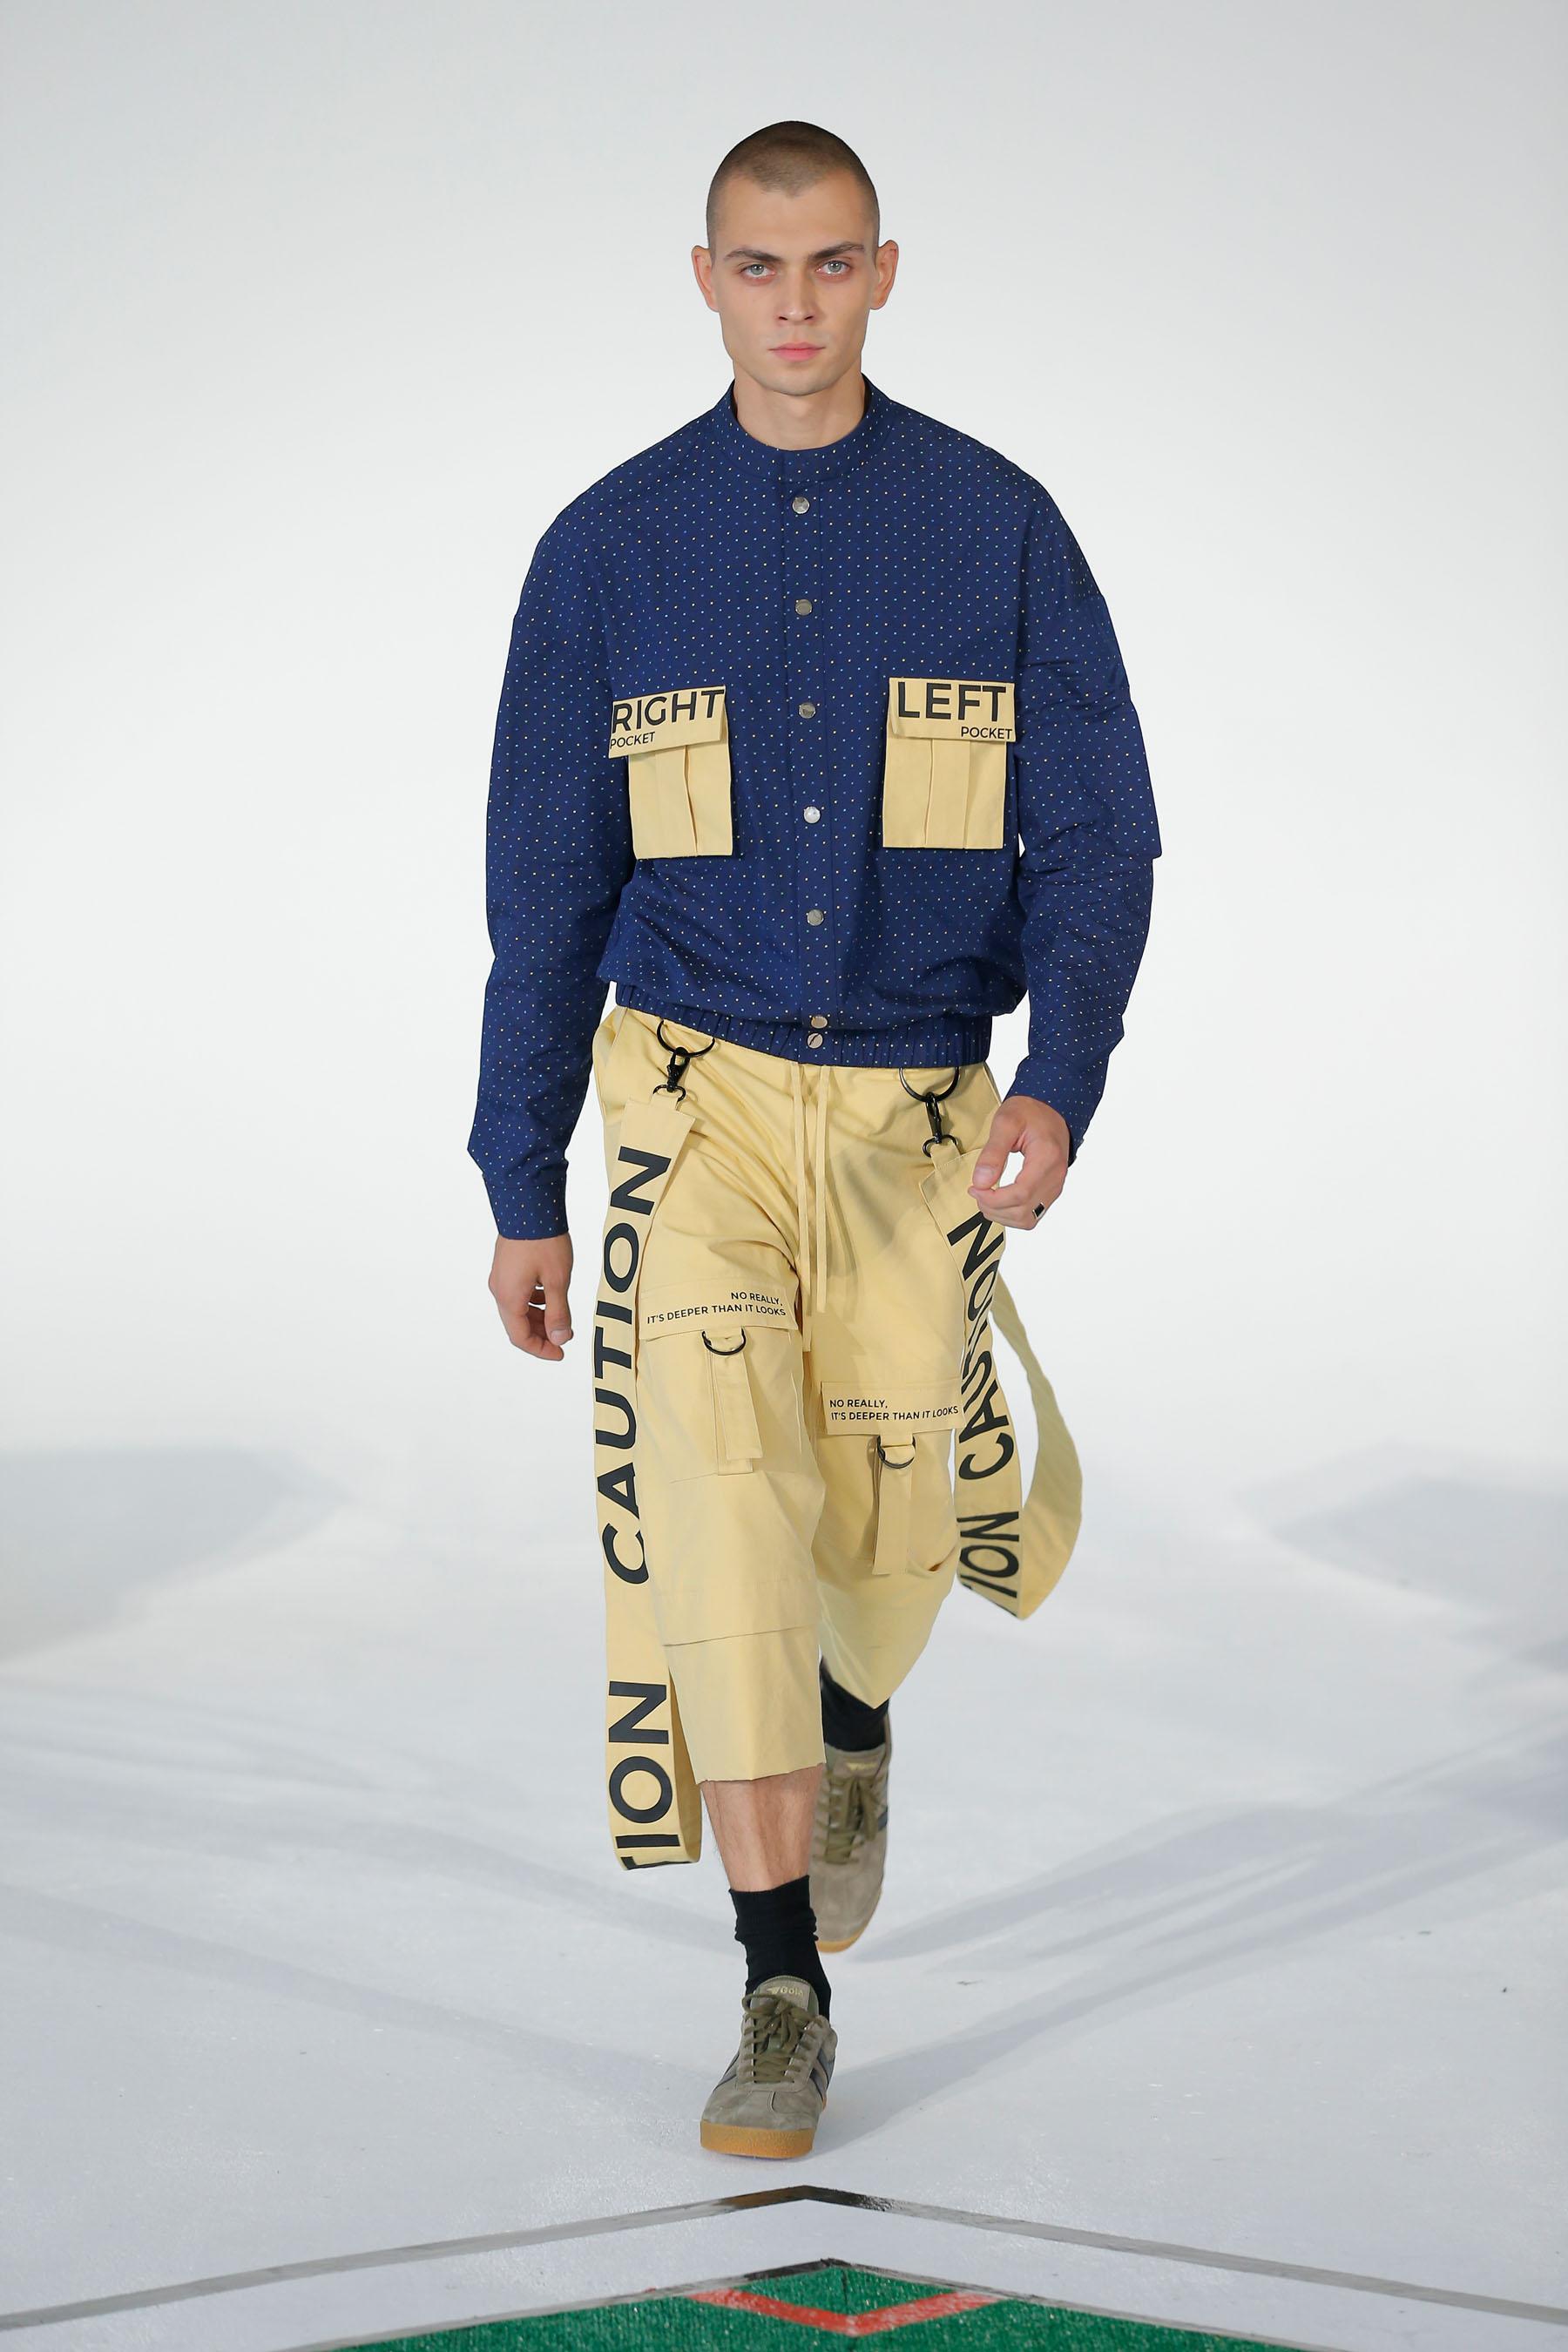 Men's Fashion Trends For 2018 FashionBeans 30